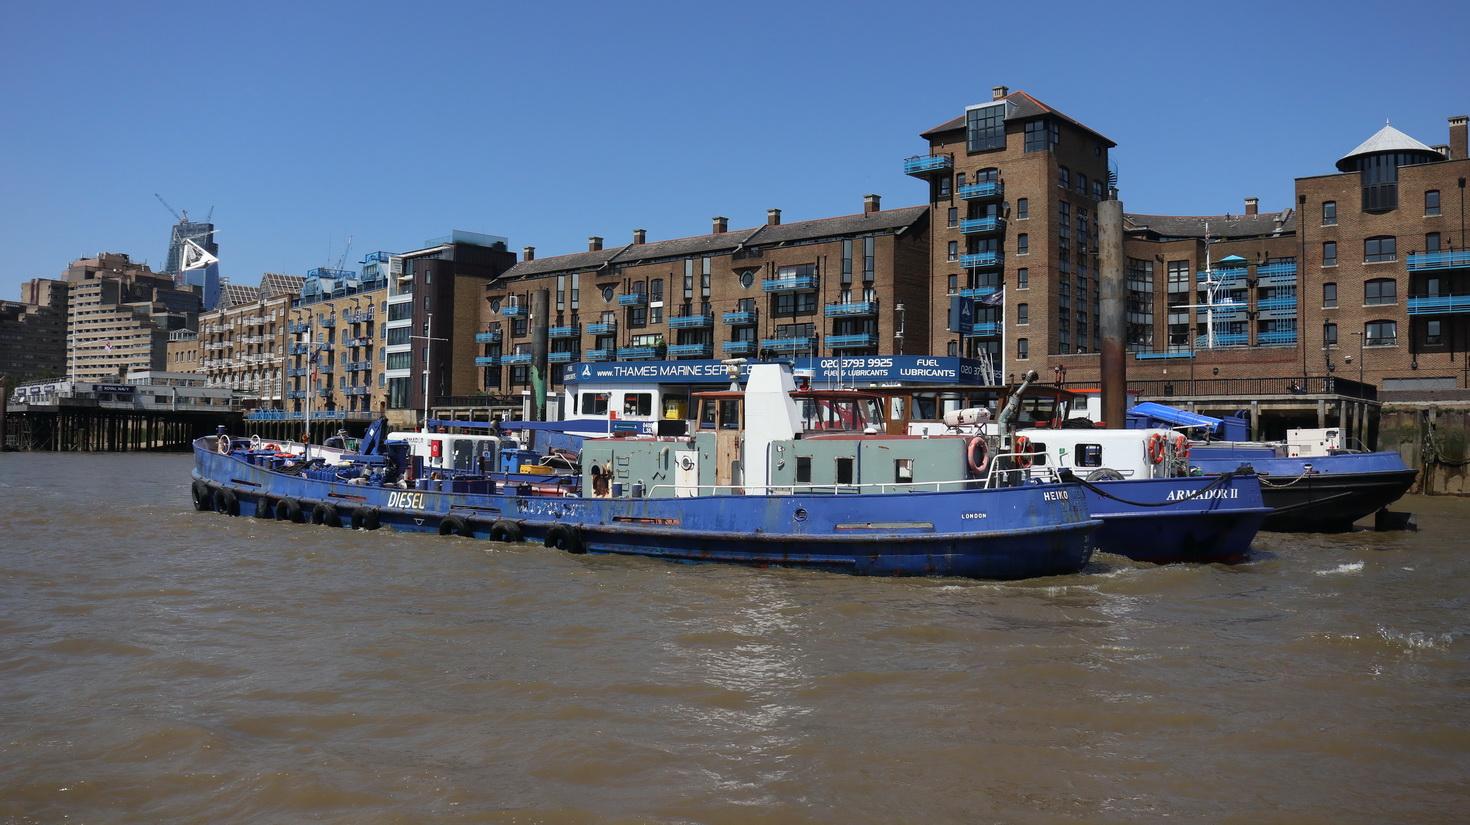 Trip boat service boats